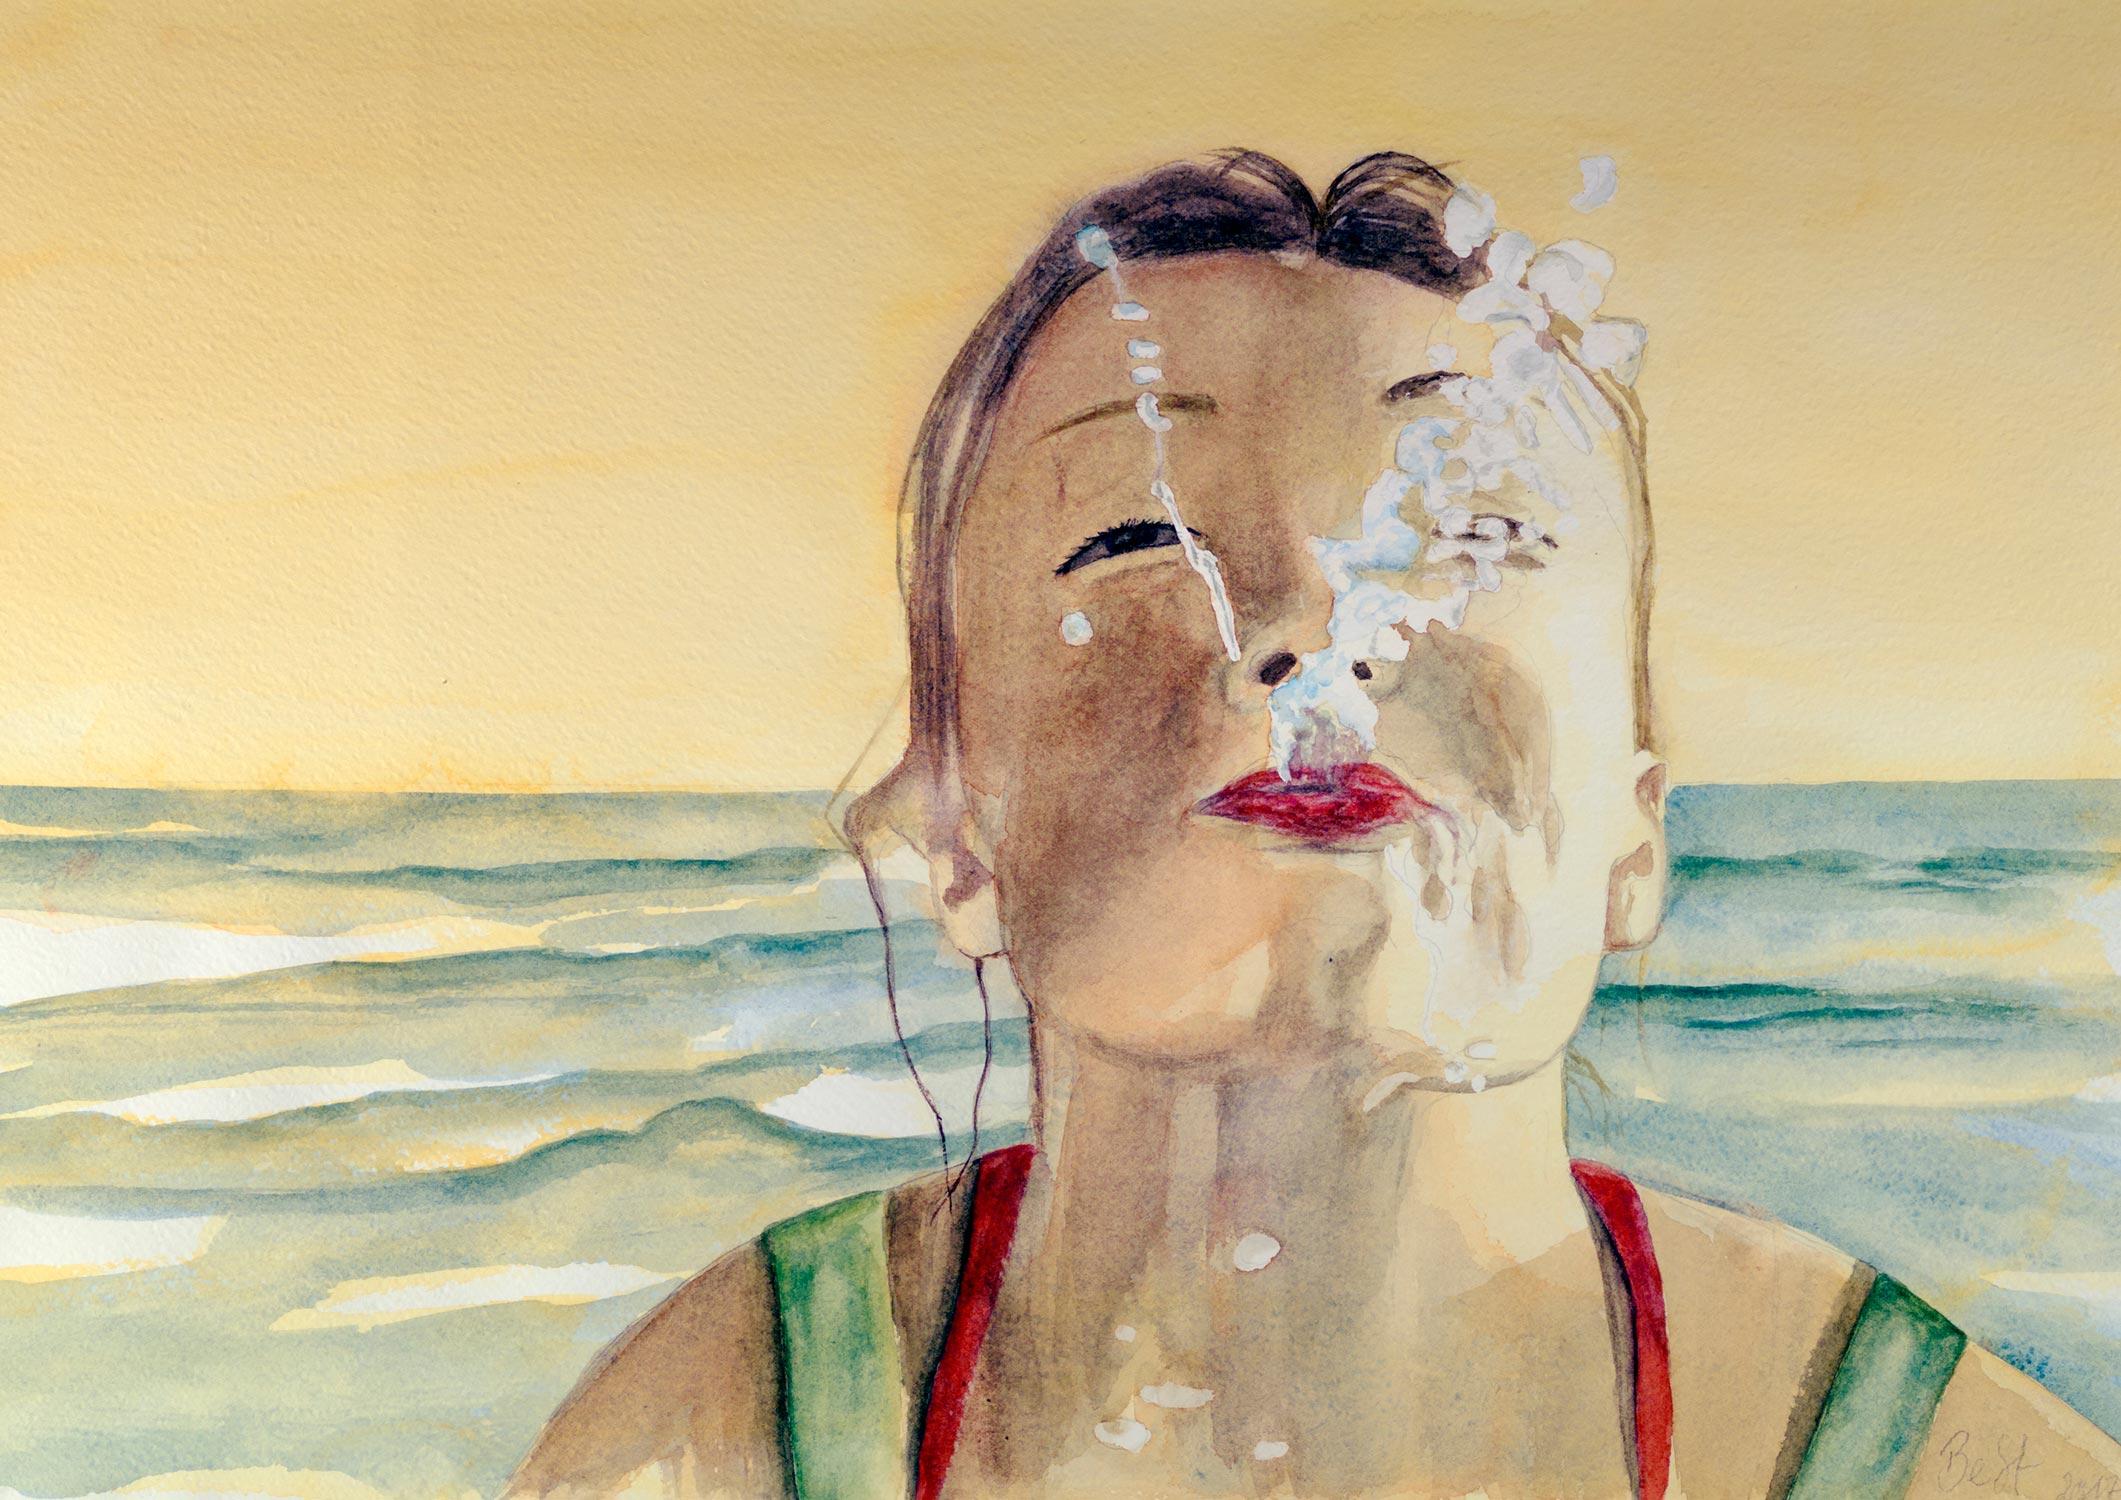 Fun Splash by Bettina Stegemann